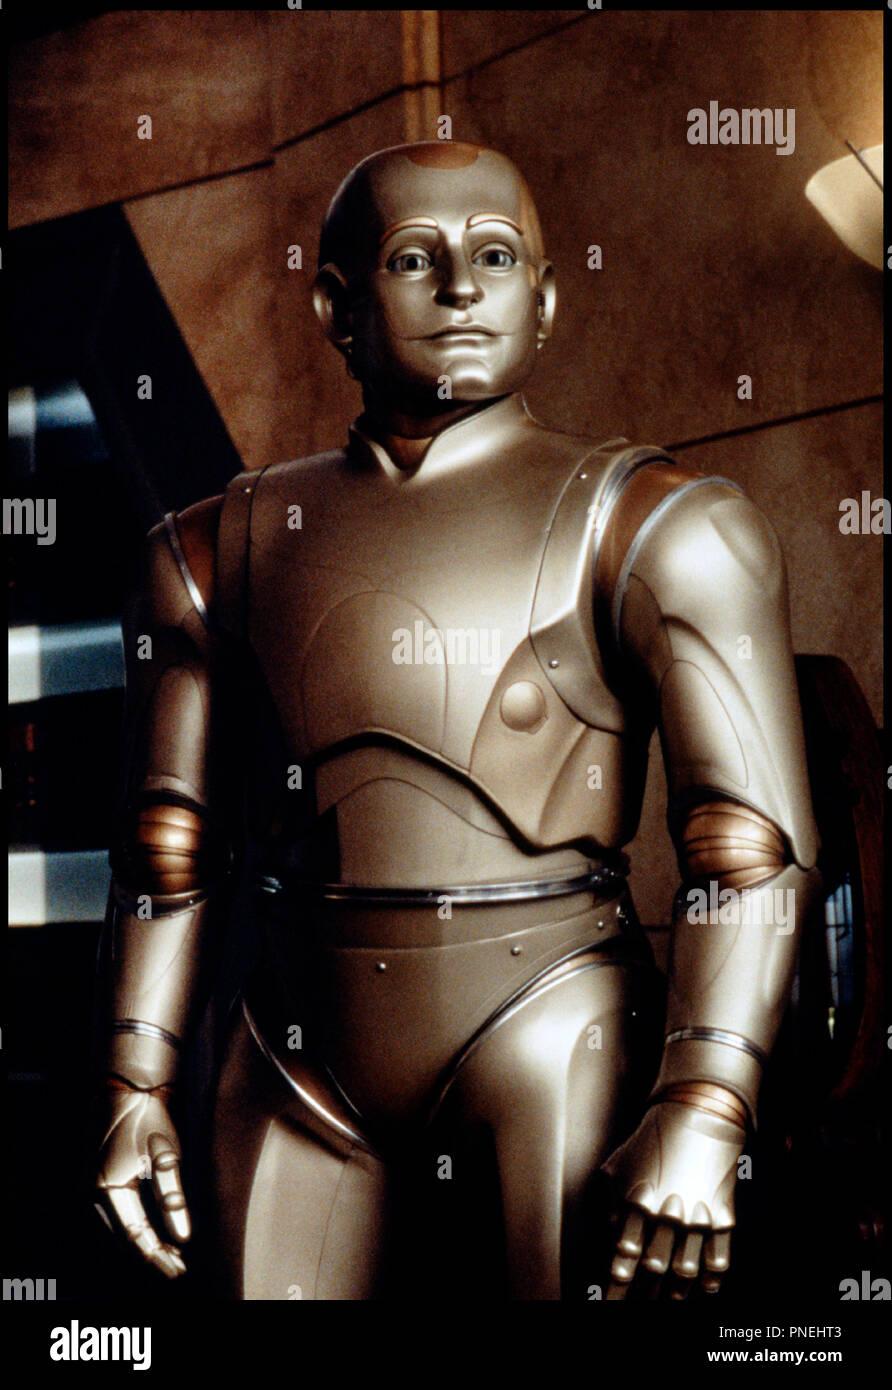 Prod DB © Columbia / DR L'HOMME BICENTENAIRE (BICENTENNIAL MAN) de Chris Columbus 1999 USA avec Robin Williams robot, androïde d'après le roman de Isaac Asimov et Robert Silverberg - Stock Image